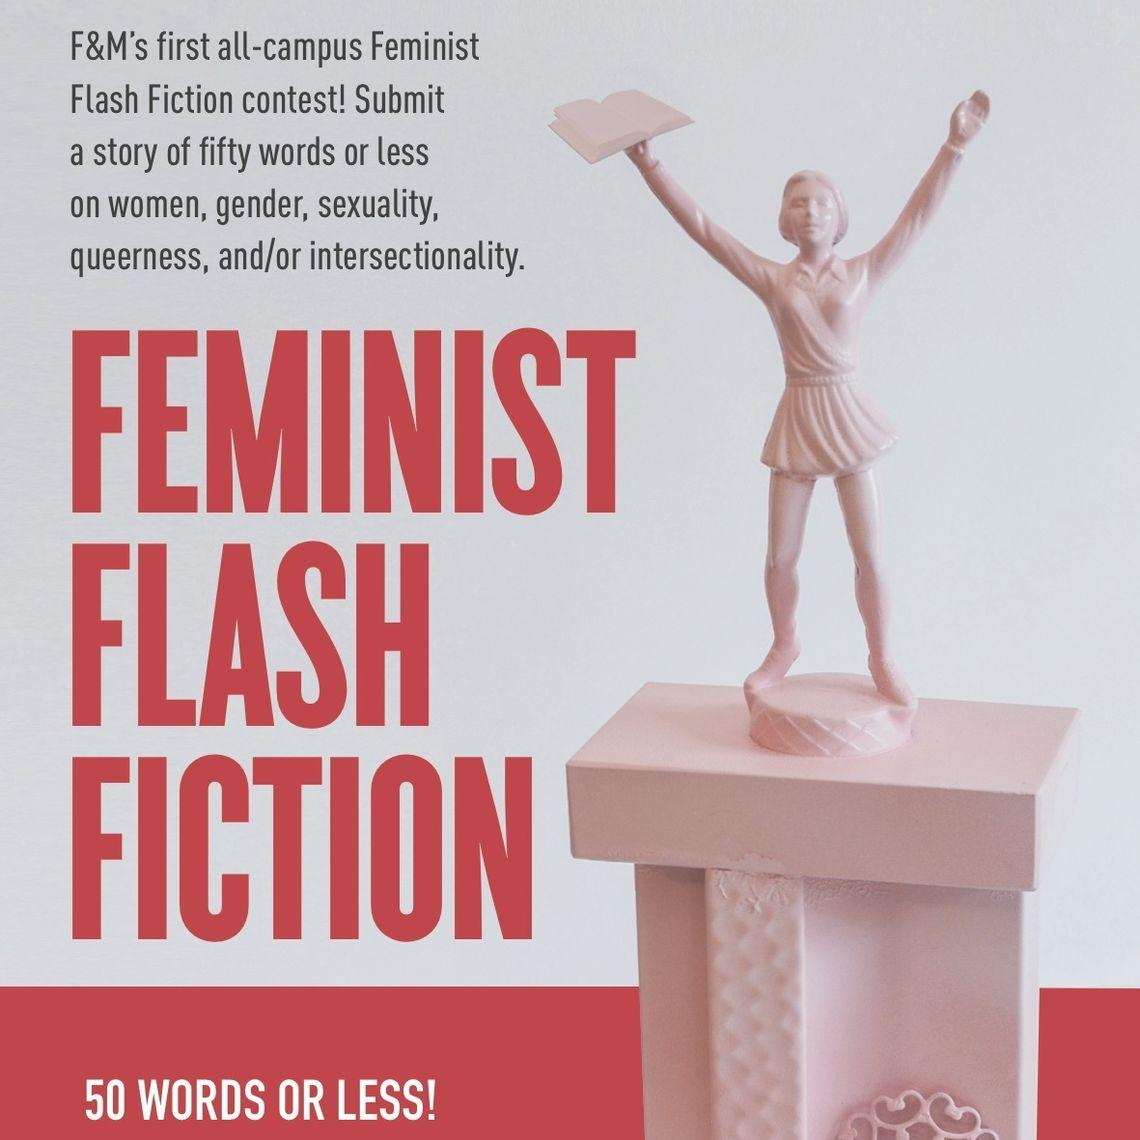 feminist flash fiction contest poster